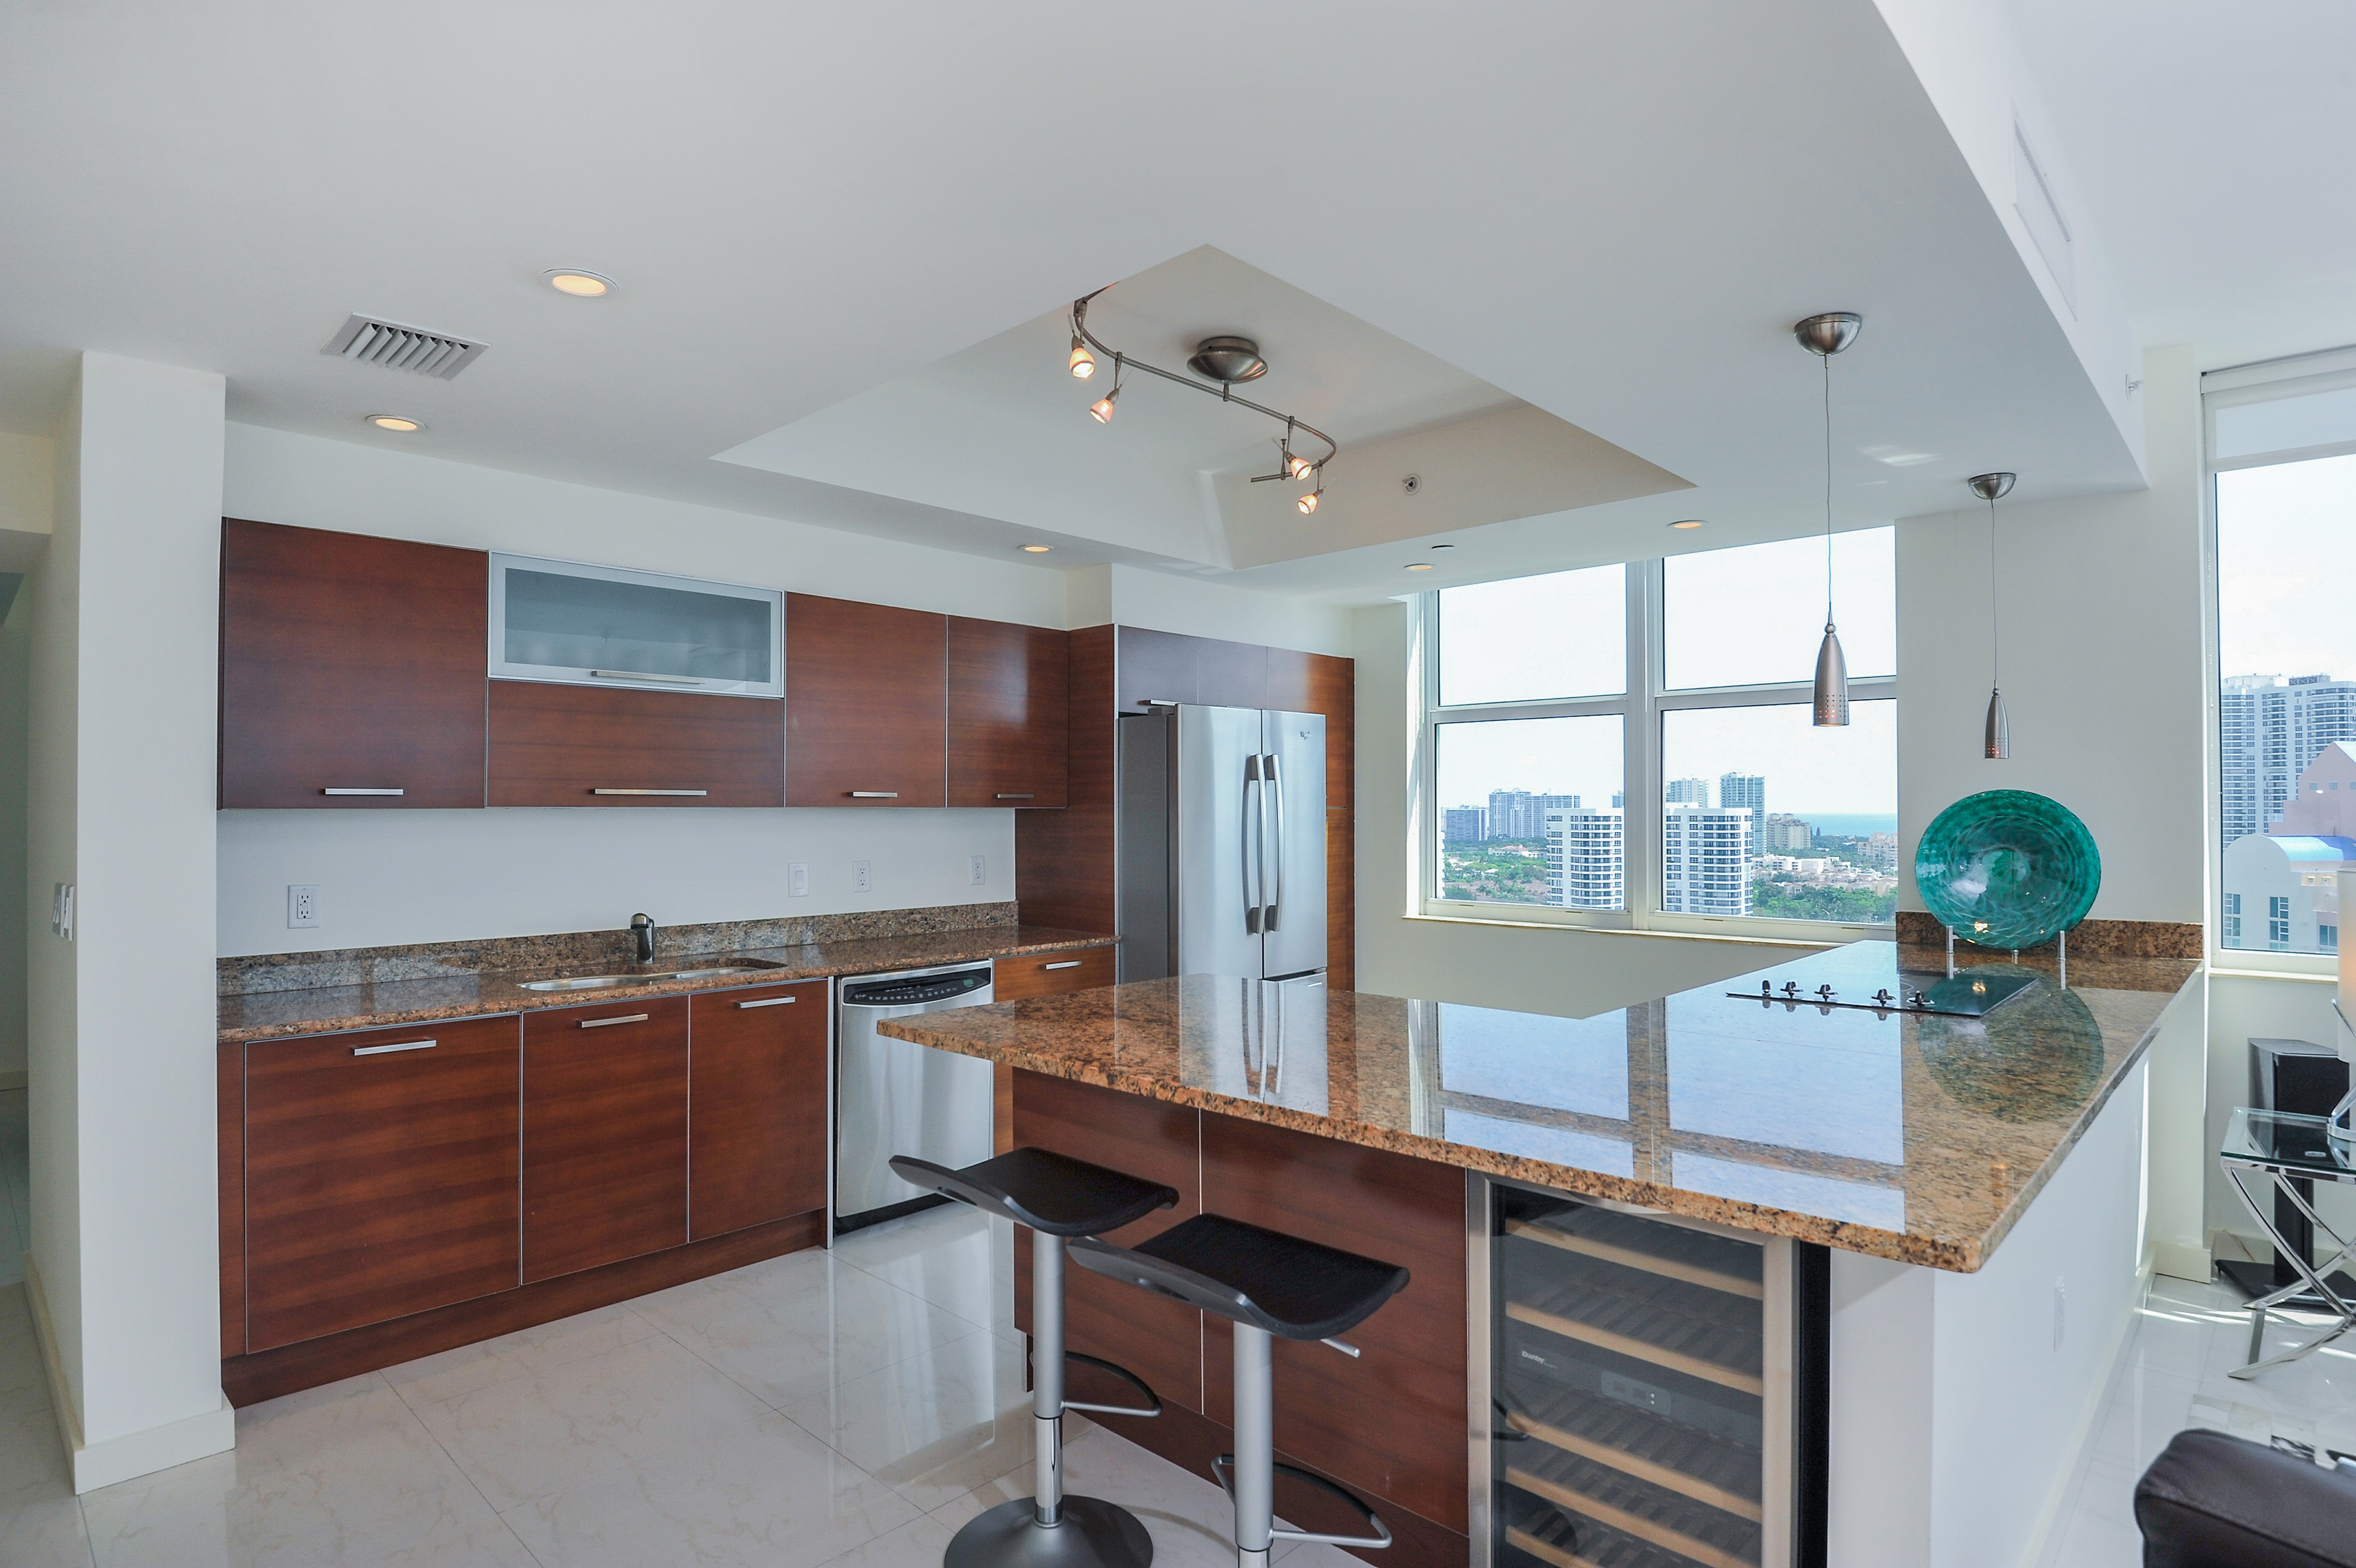 Aventura Marina Condominium and Condos in Aventura. Bayfront and ...